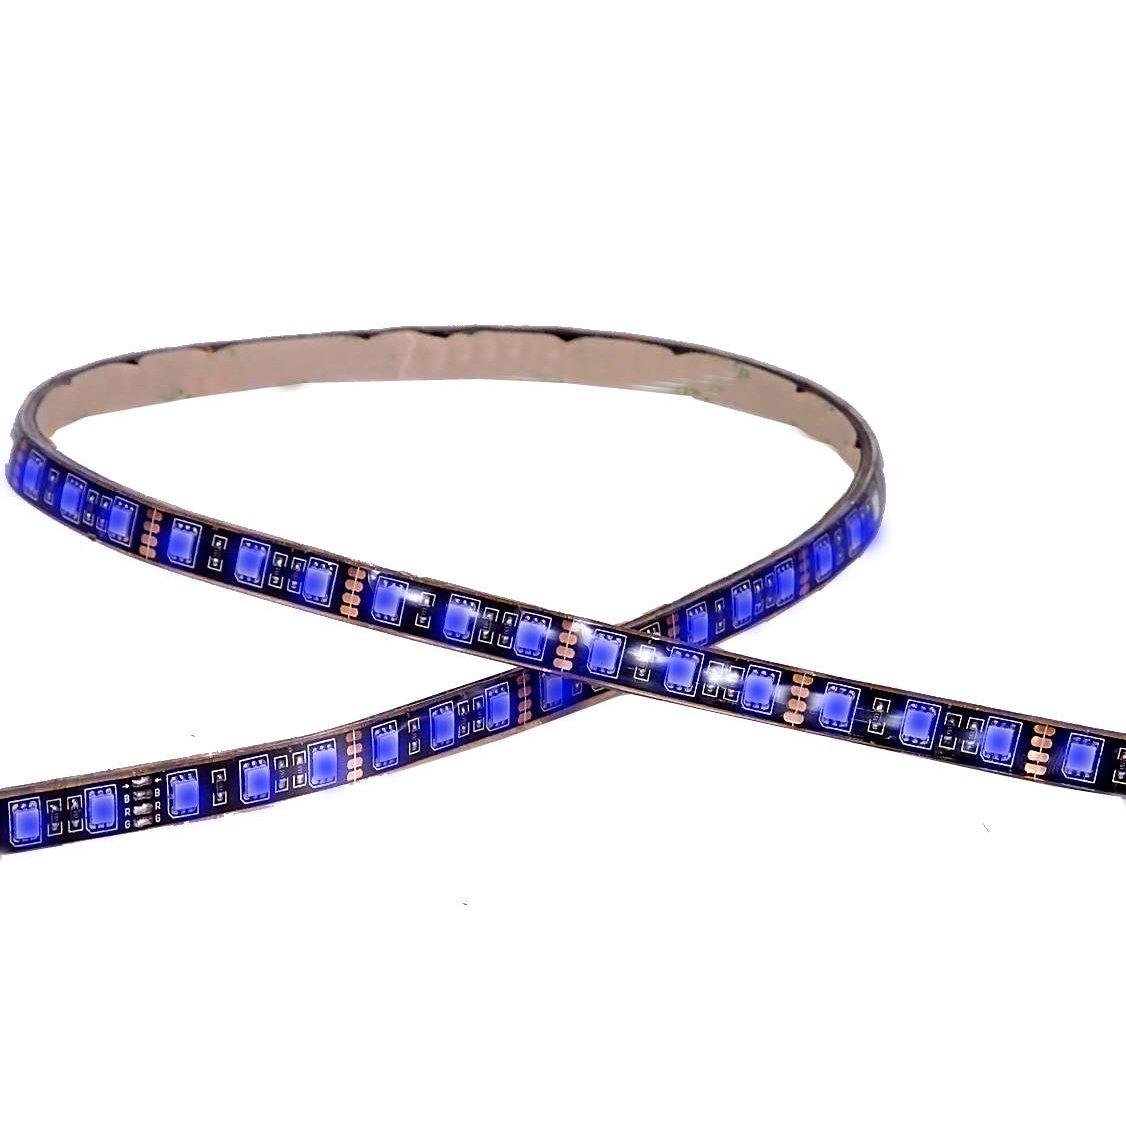 Maxxima MLS-3654BL Blue 36 LED Self-Adhesive Strip Light